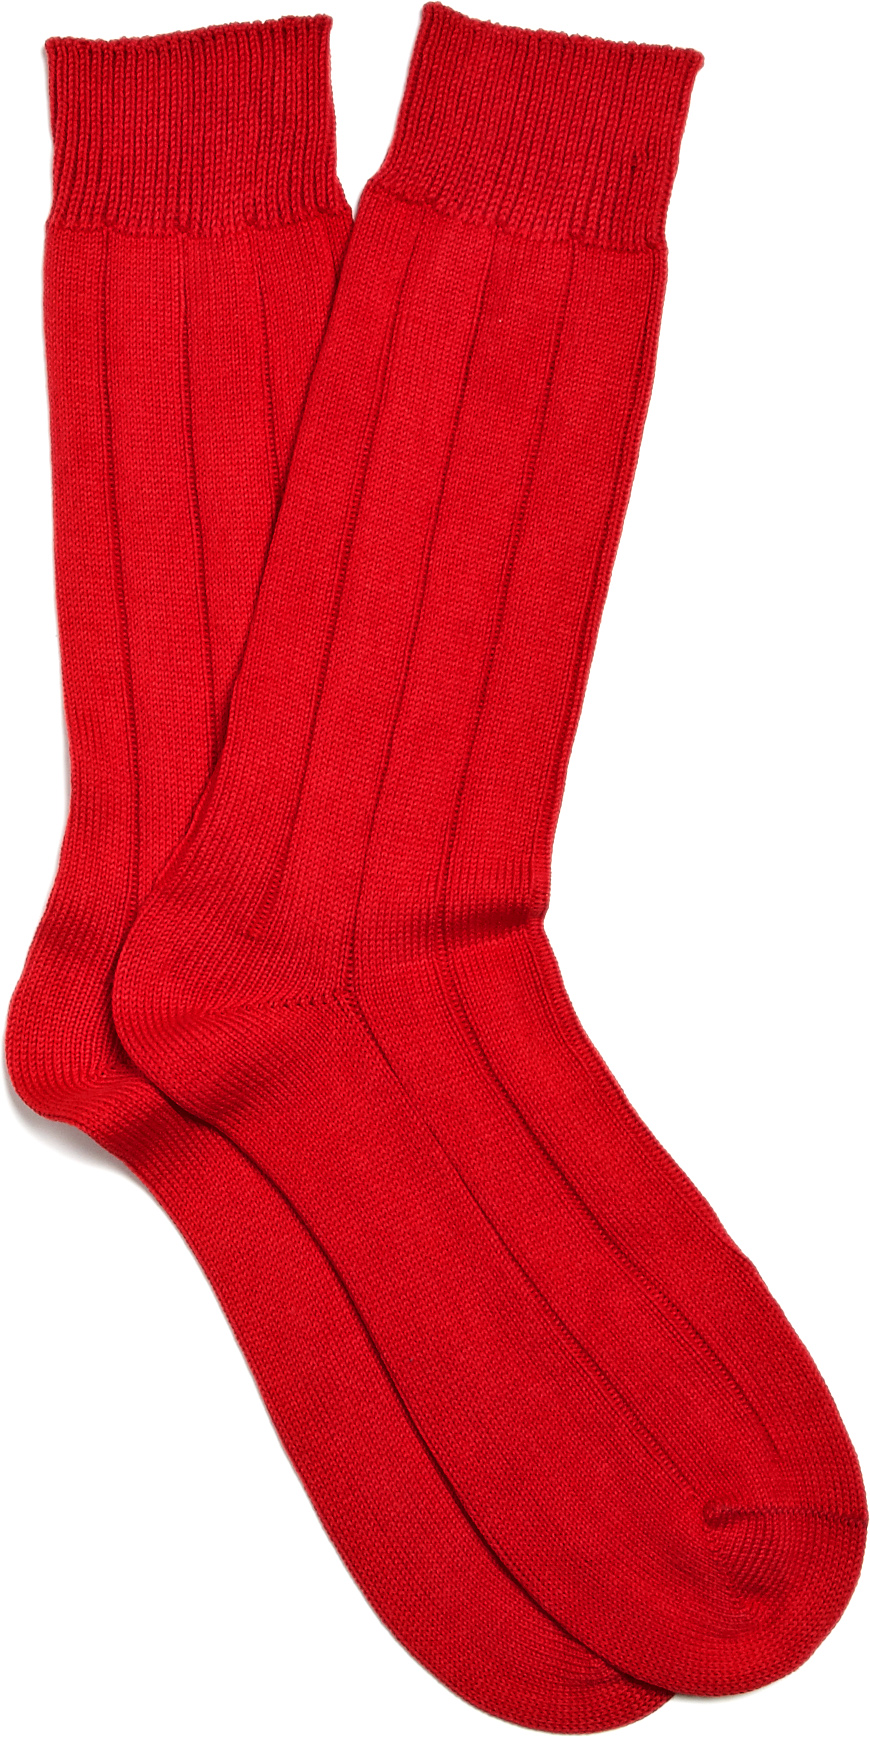 Pantherella Red Socks Proper Magazine